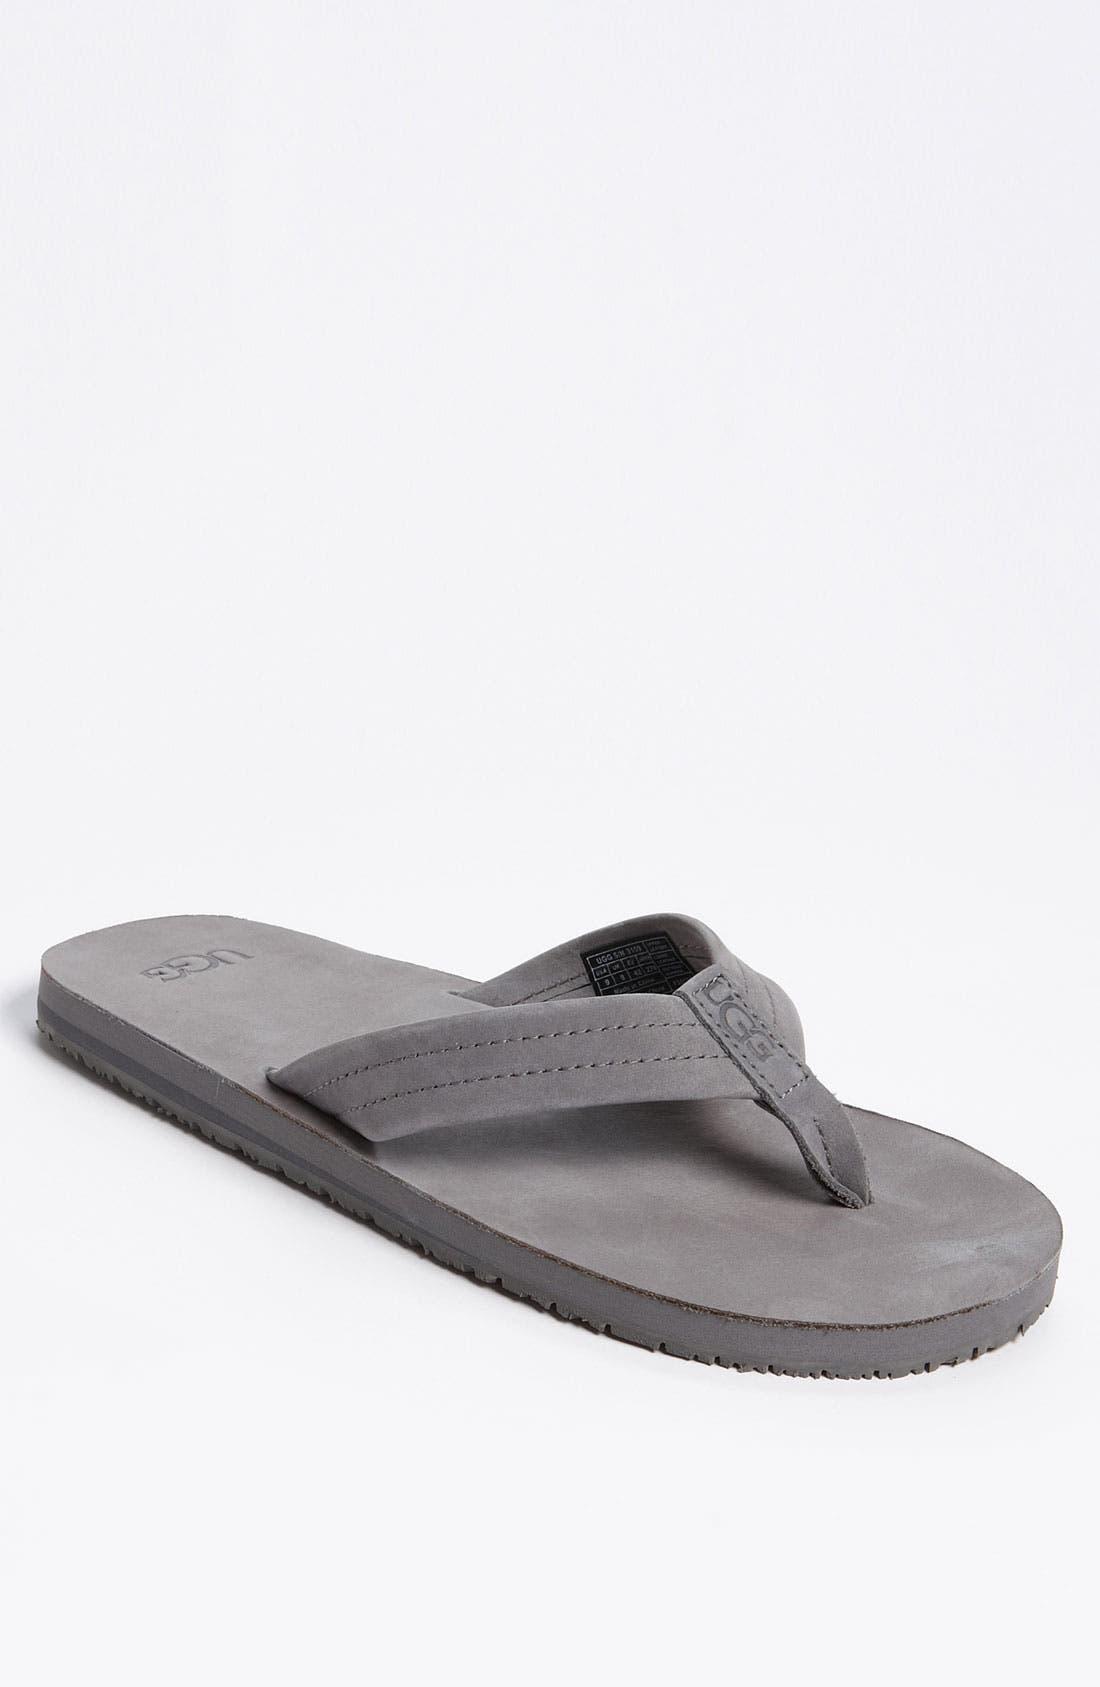 Alternate Image 1 Selected - UGG® Australia 'Camano' Flip Flop (Men)